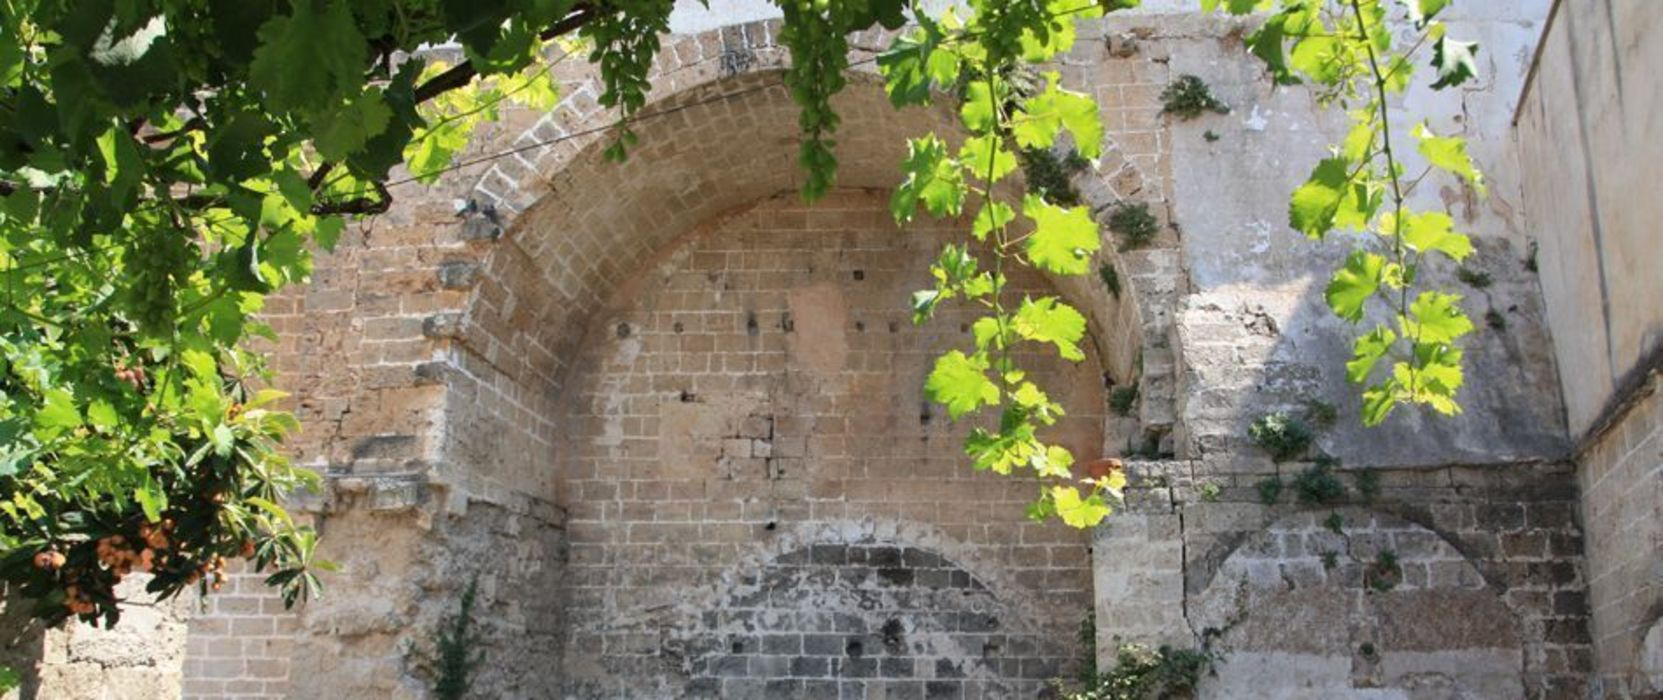 Il giardino segreto otragiardini Giardino in stile mediterraneo